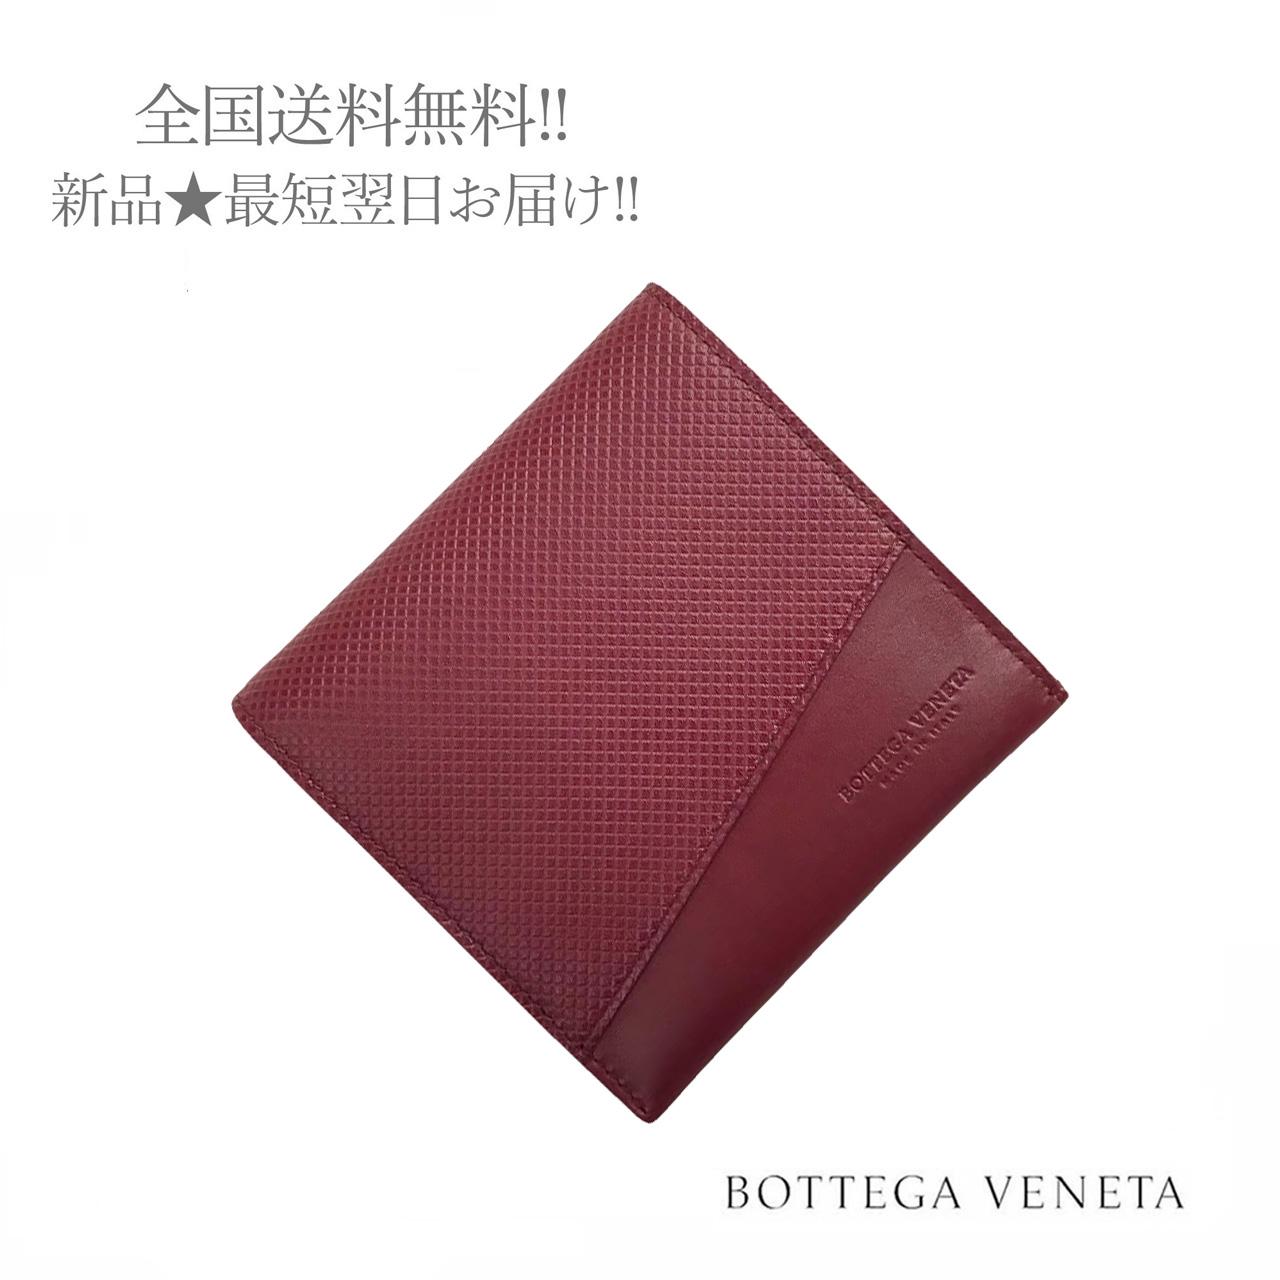 BOTTEGA 日本製 VENETA ボッテガ 売り出し ヴェネタ 財布 ウォレット 二つ折り 男 6337 イタリア製 メンズ 新品 ボルドー